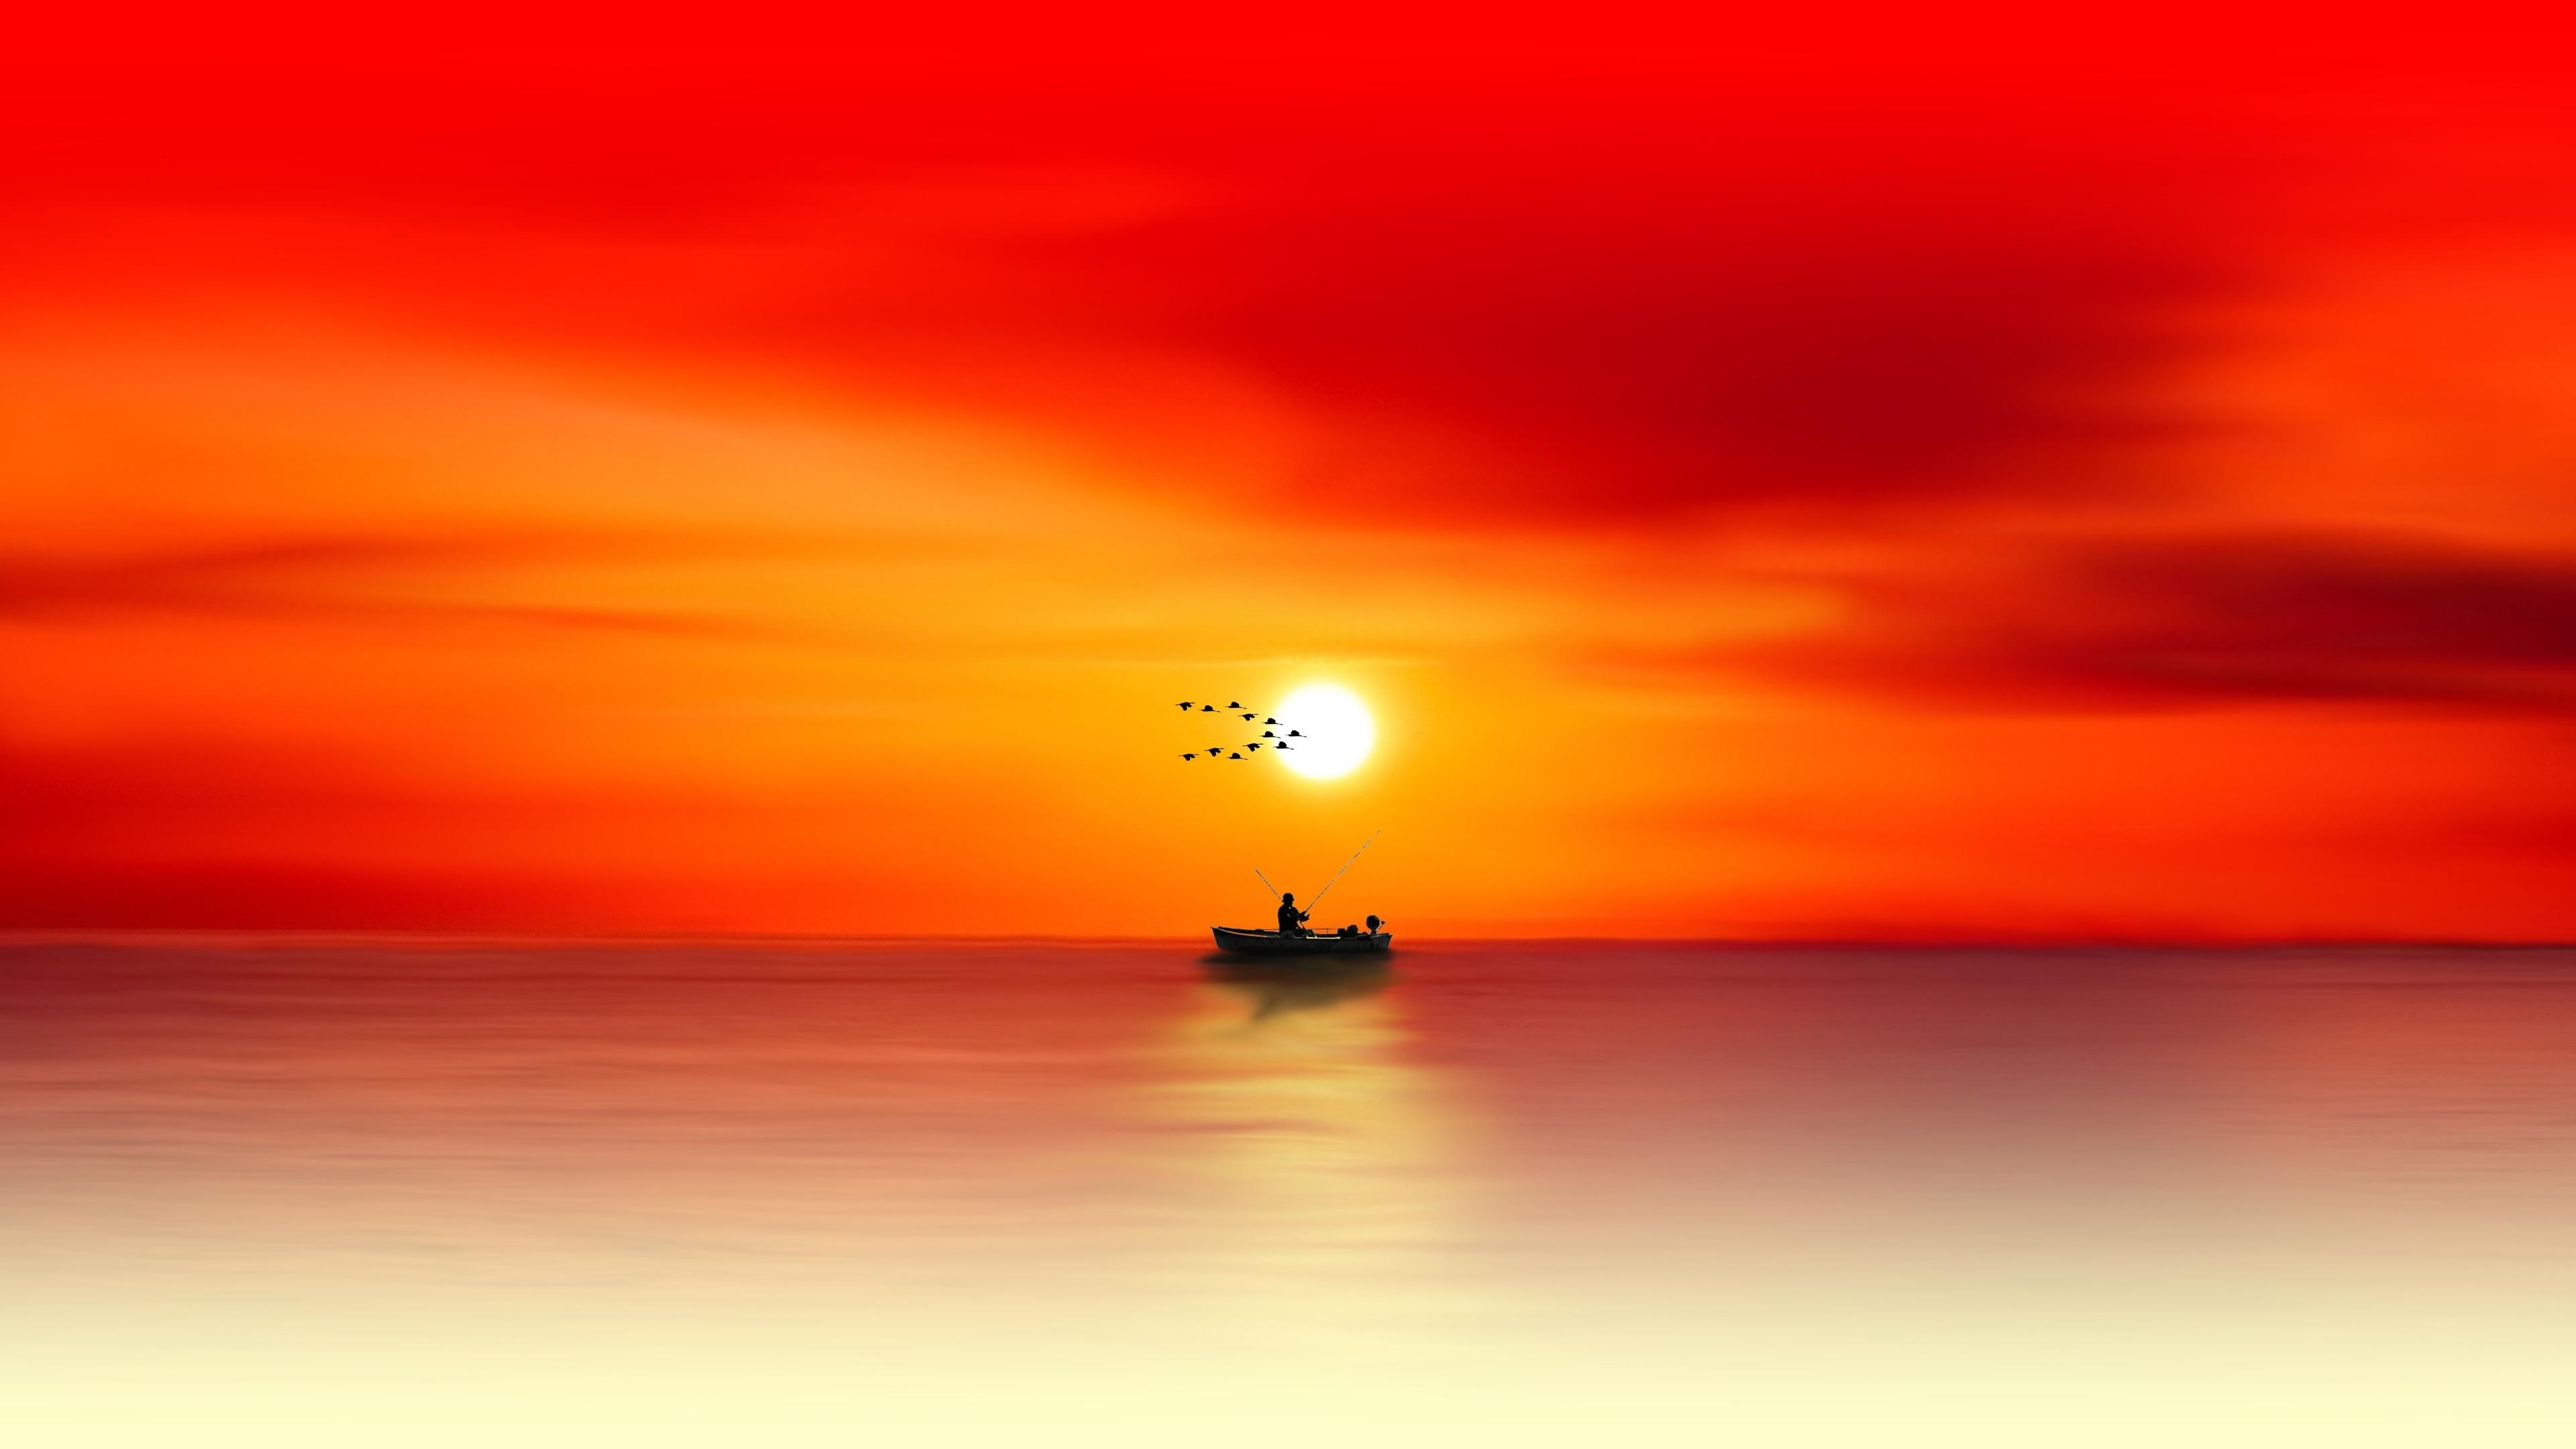 waters sea sun dusk evening 4k 1540139297 - Waters Sea Sun Dusk Evening 4k - sunset wallpapers, nature wallpapers, hd-wallpapers, evening wallpapers, dusk wallpapers, dawn wallpapers, 5k wallpapers, 4k-wallpapers